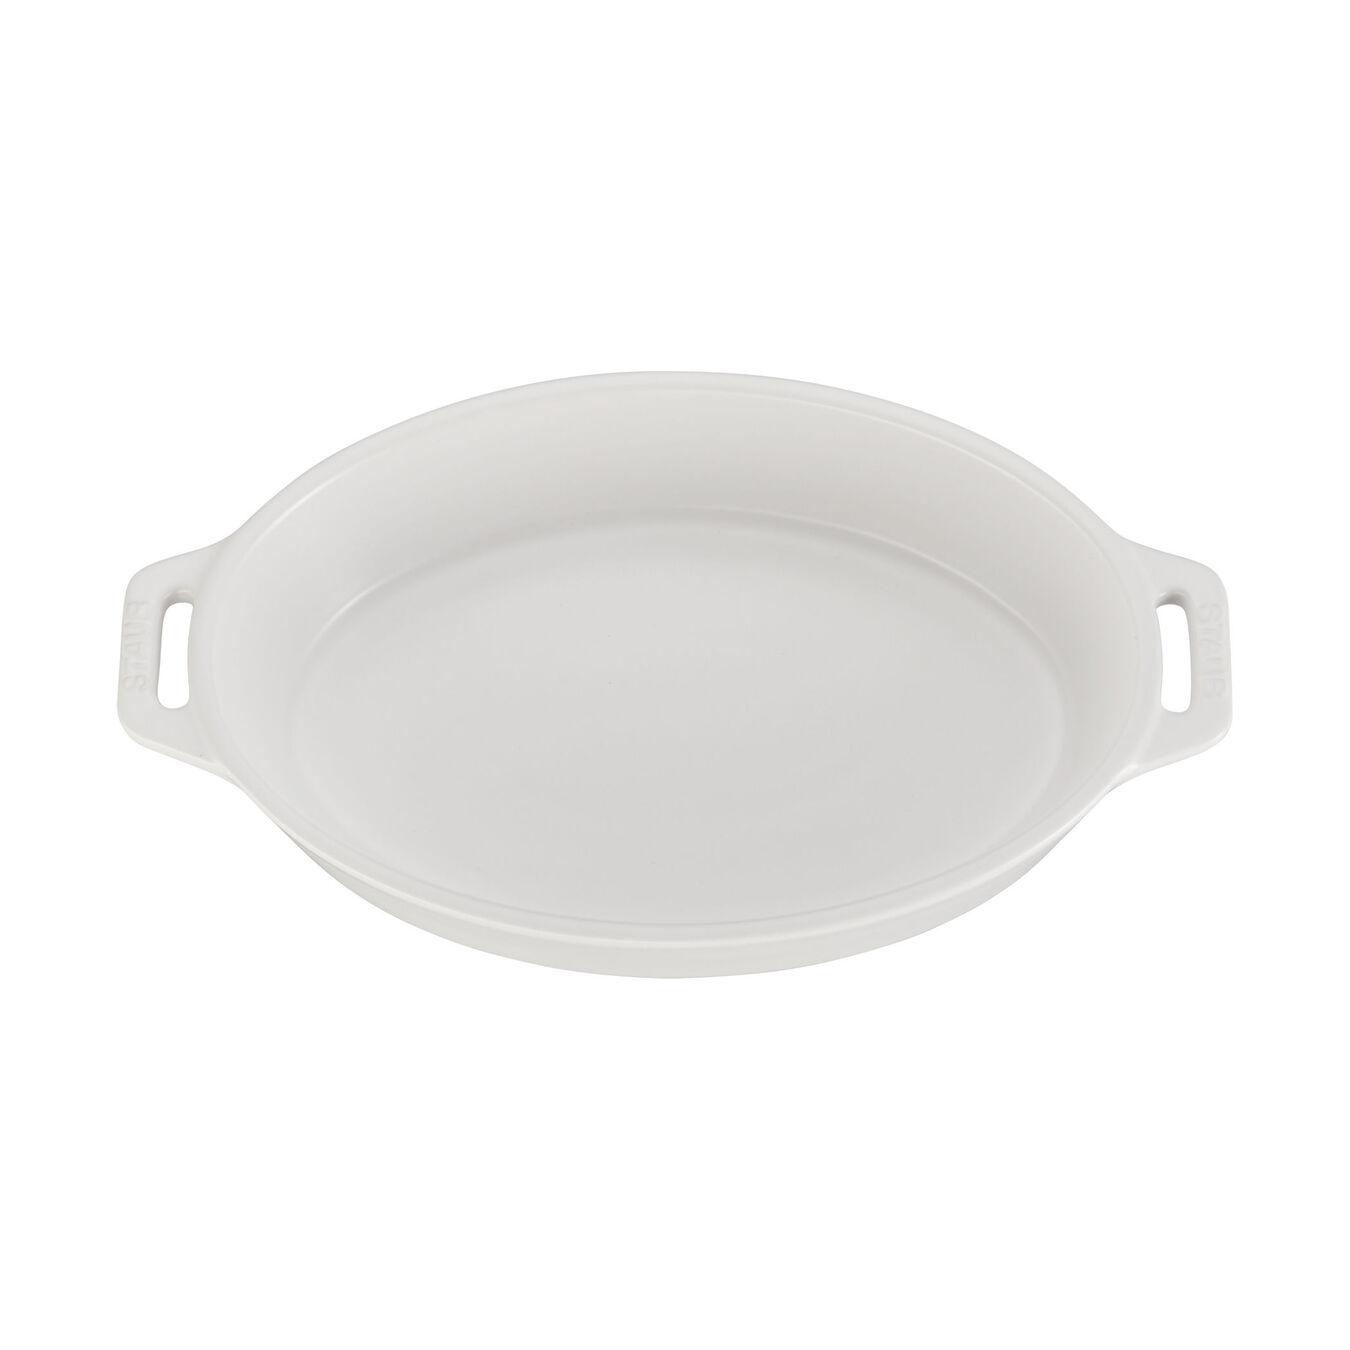 9-inch Oval Baking Dish - Matte White,,large 2